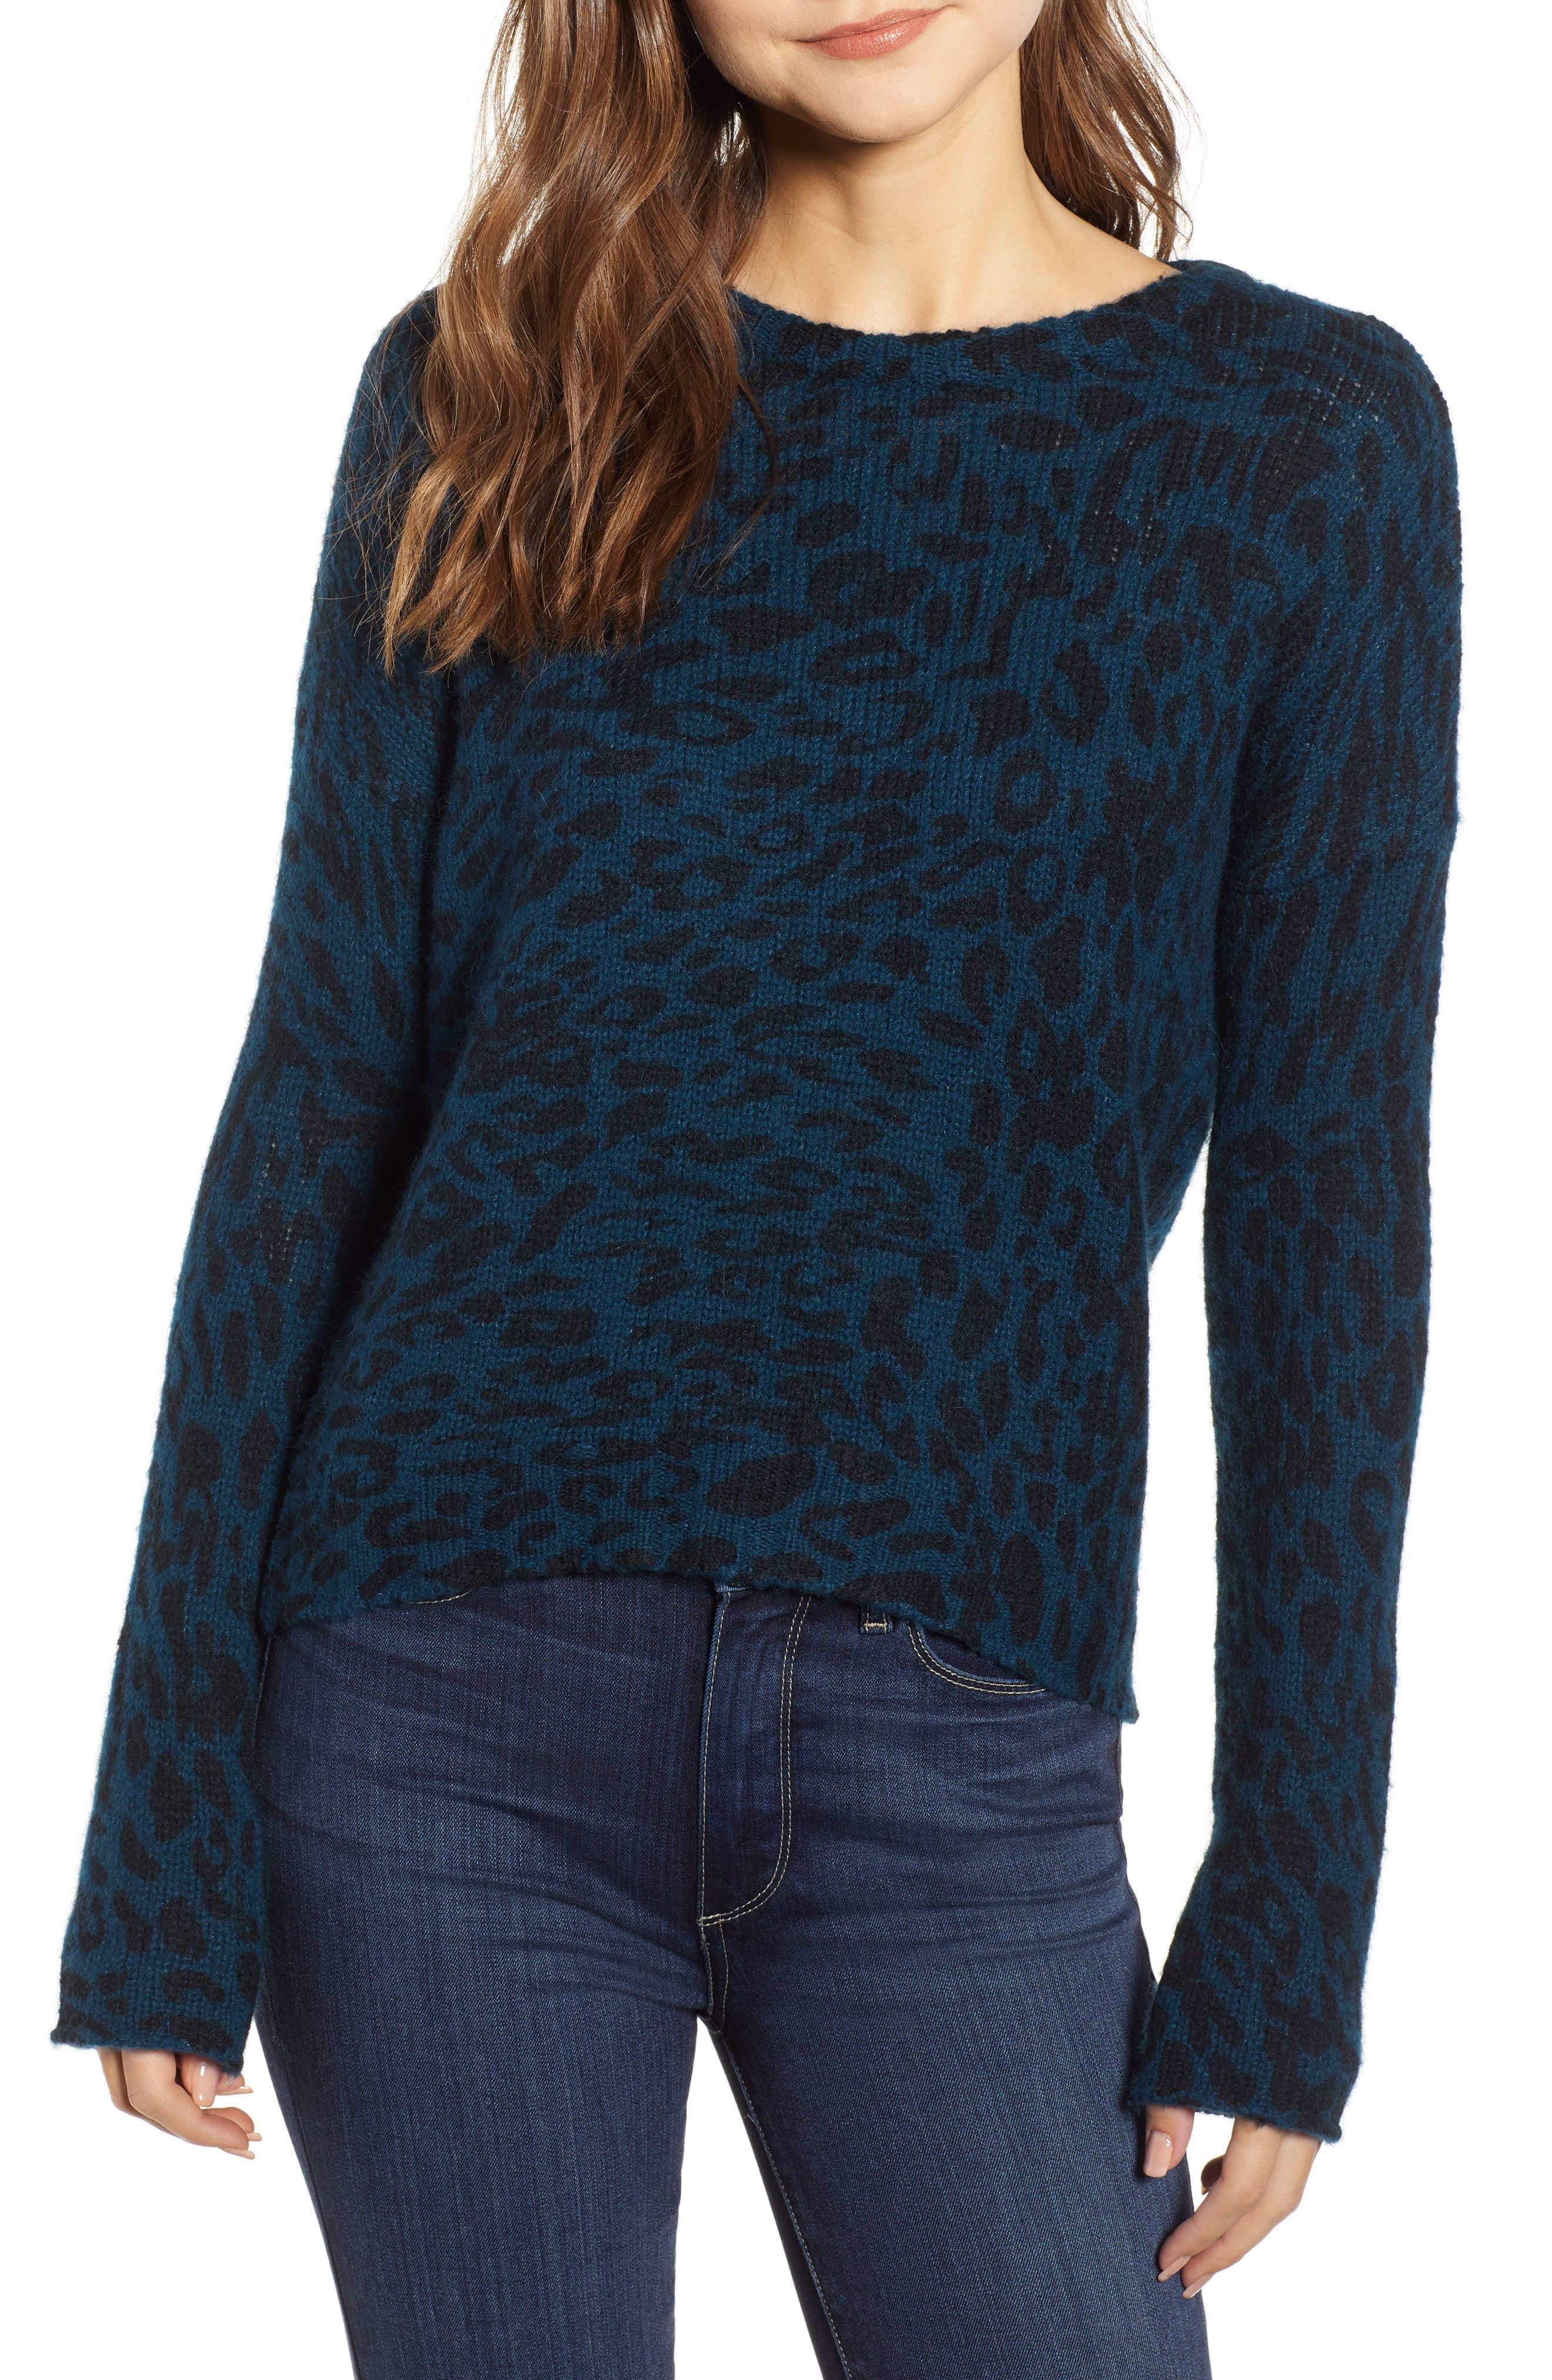 Donovan Animal Print Sweater,                         Main,                         color, BLUE LEOPARD